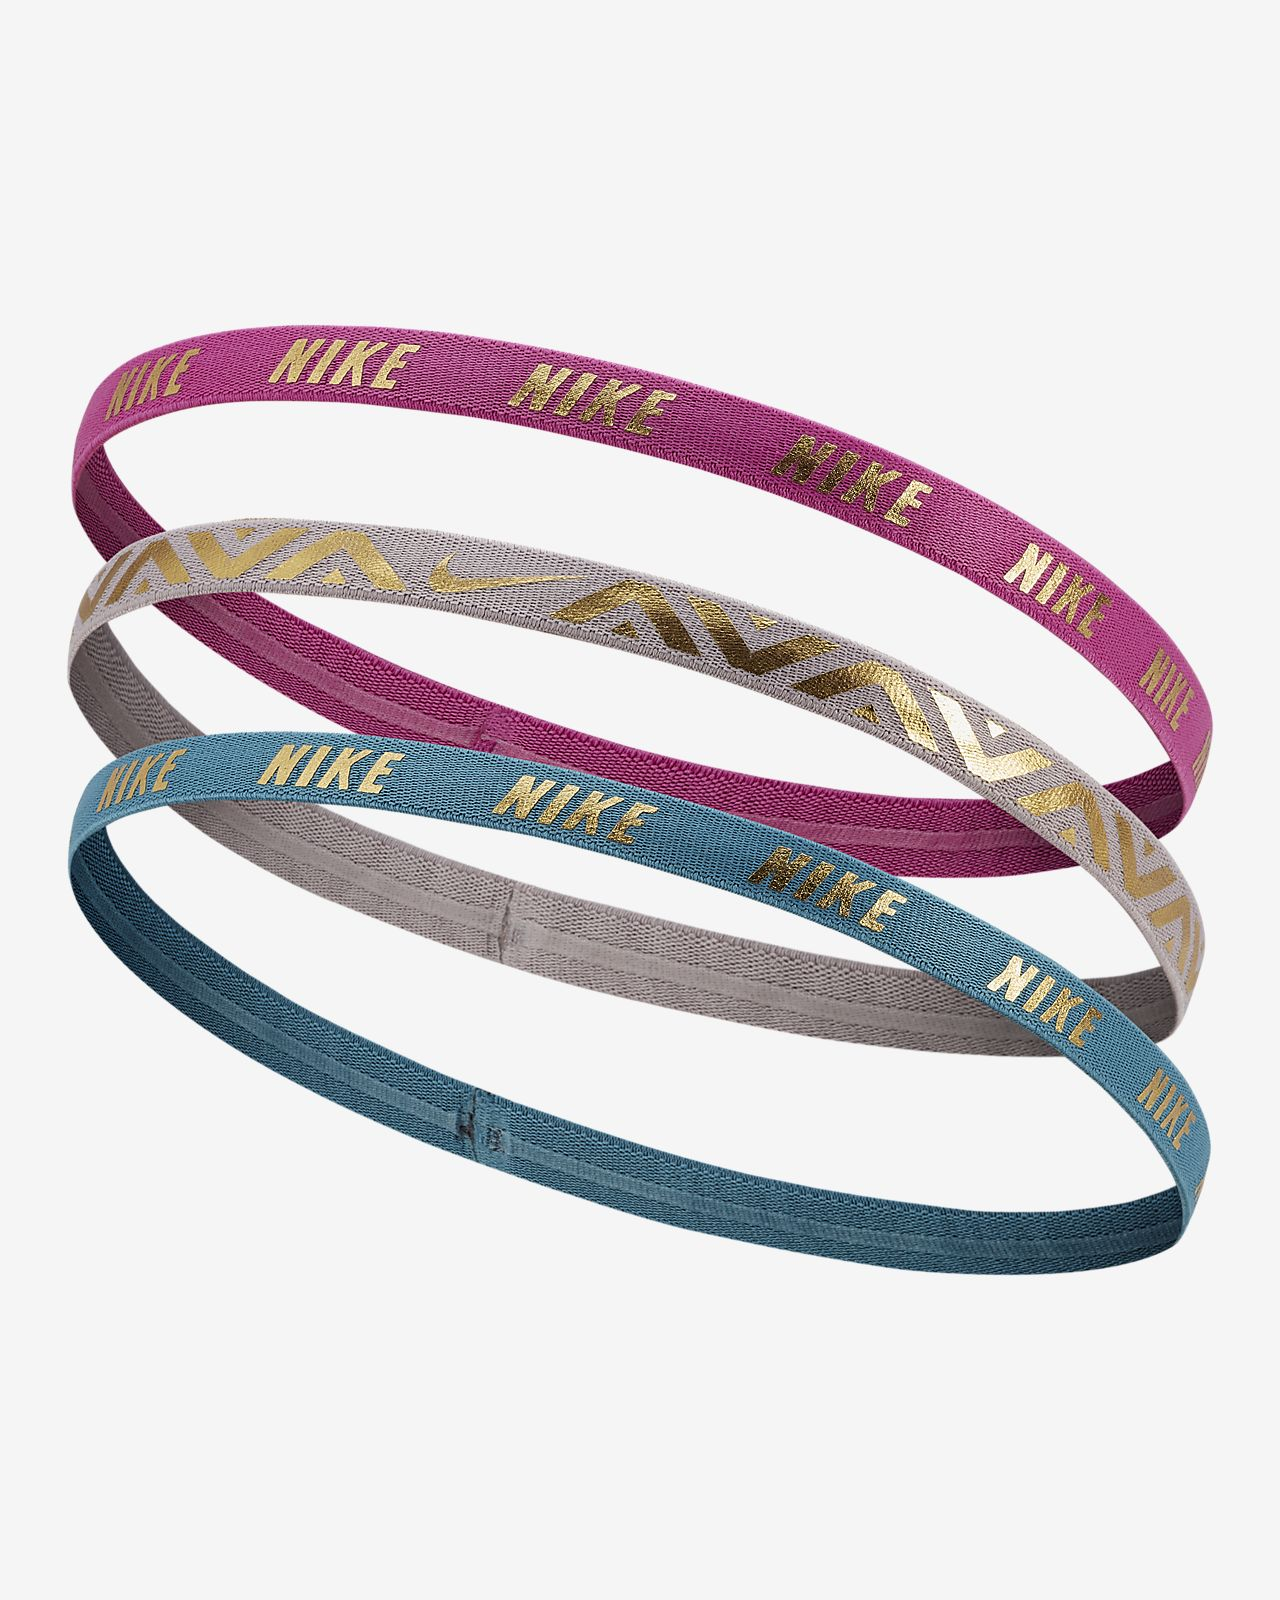 ... Nike Metallic Hairbands (3 Pack)